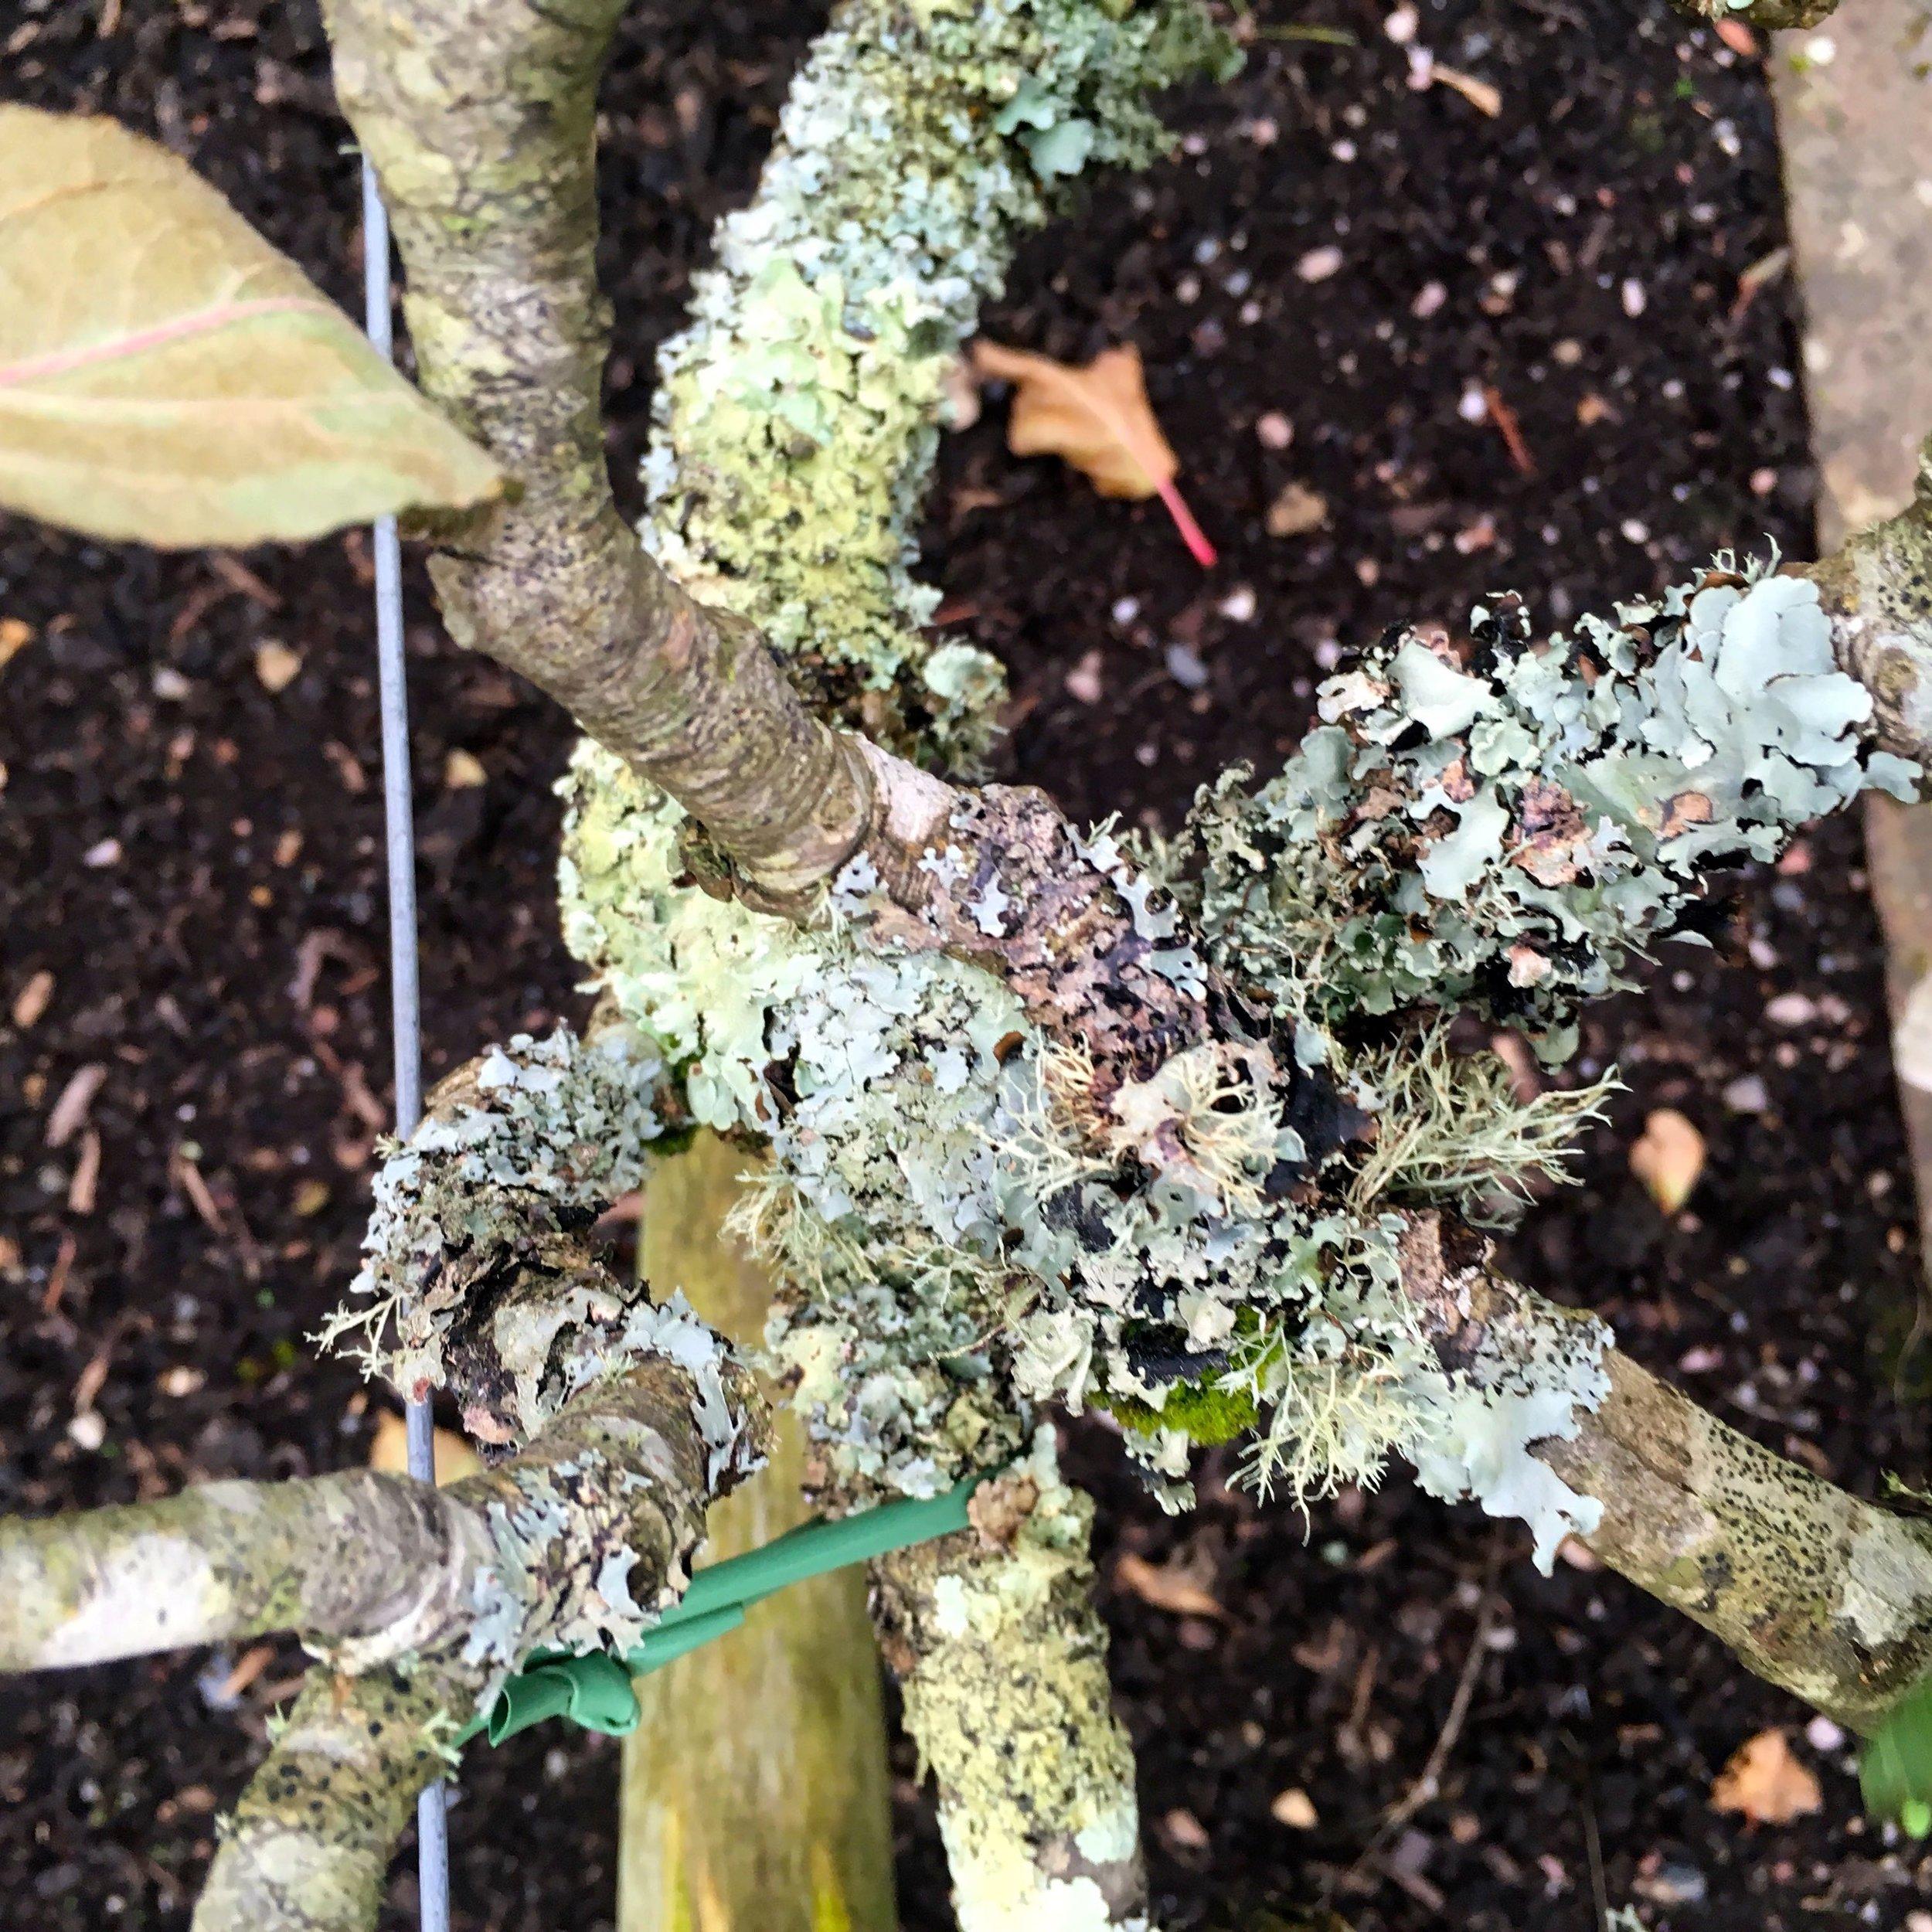 lichen on plants in the vegetable garden at RHS Rosemoor